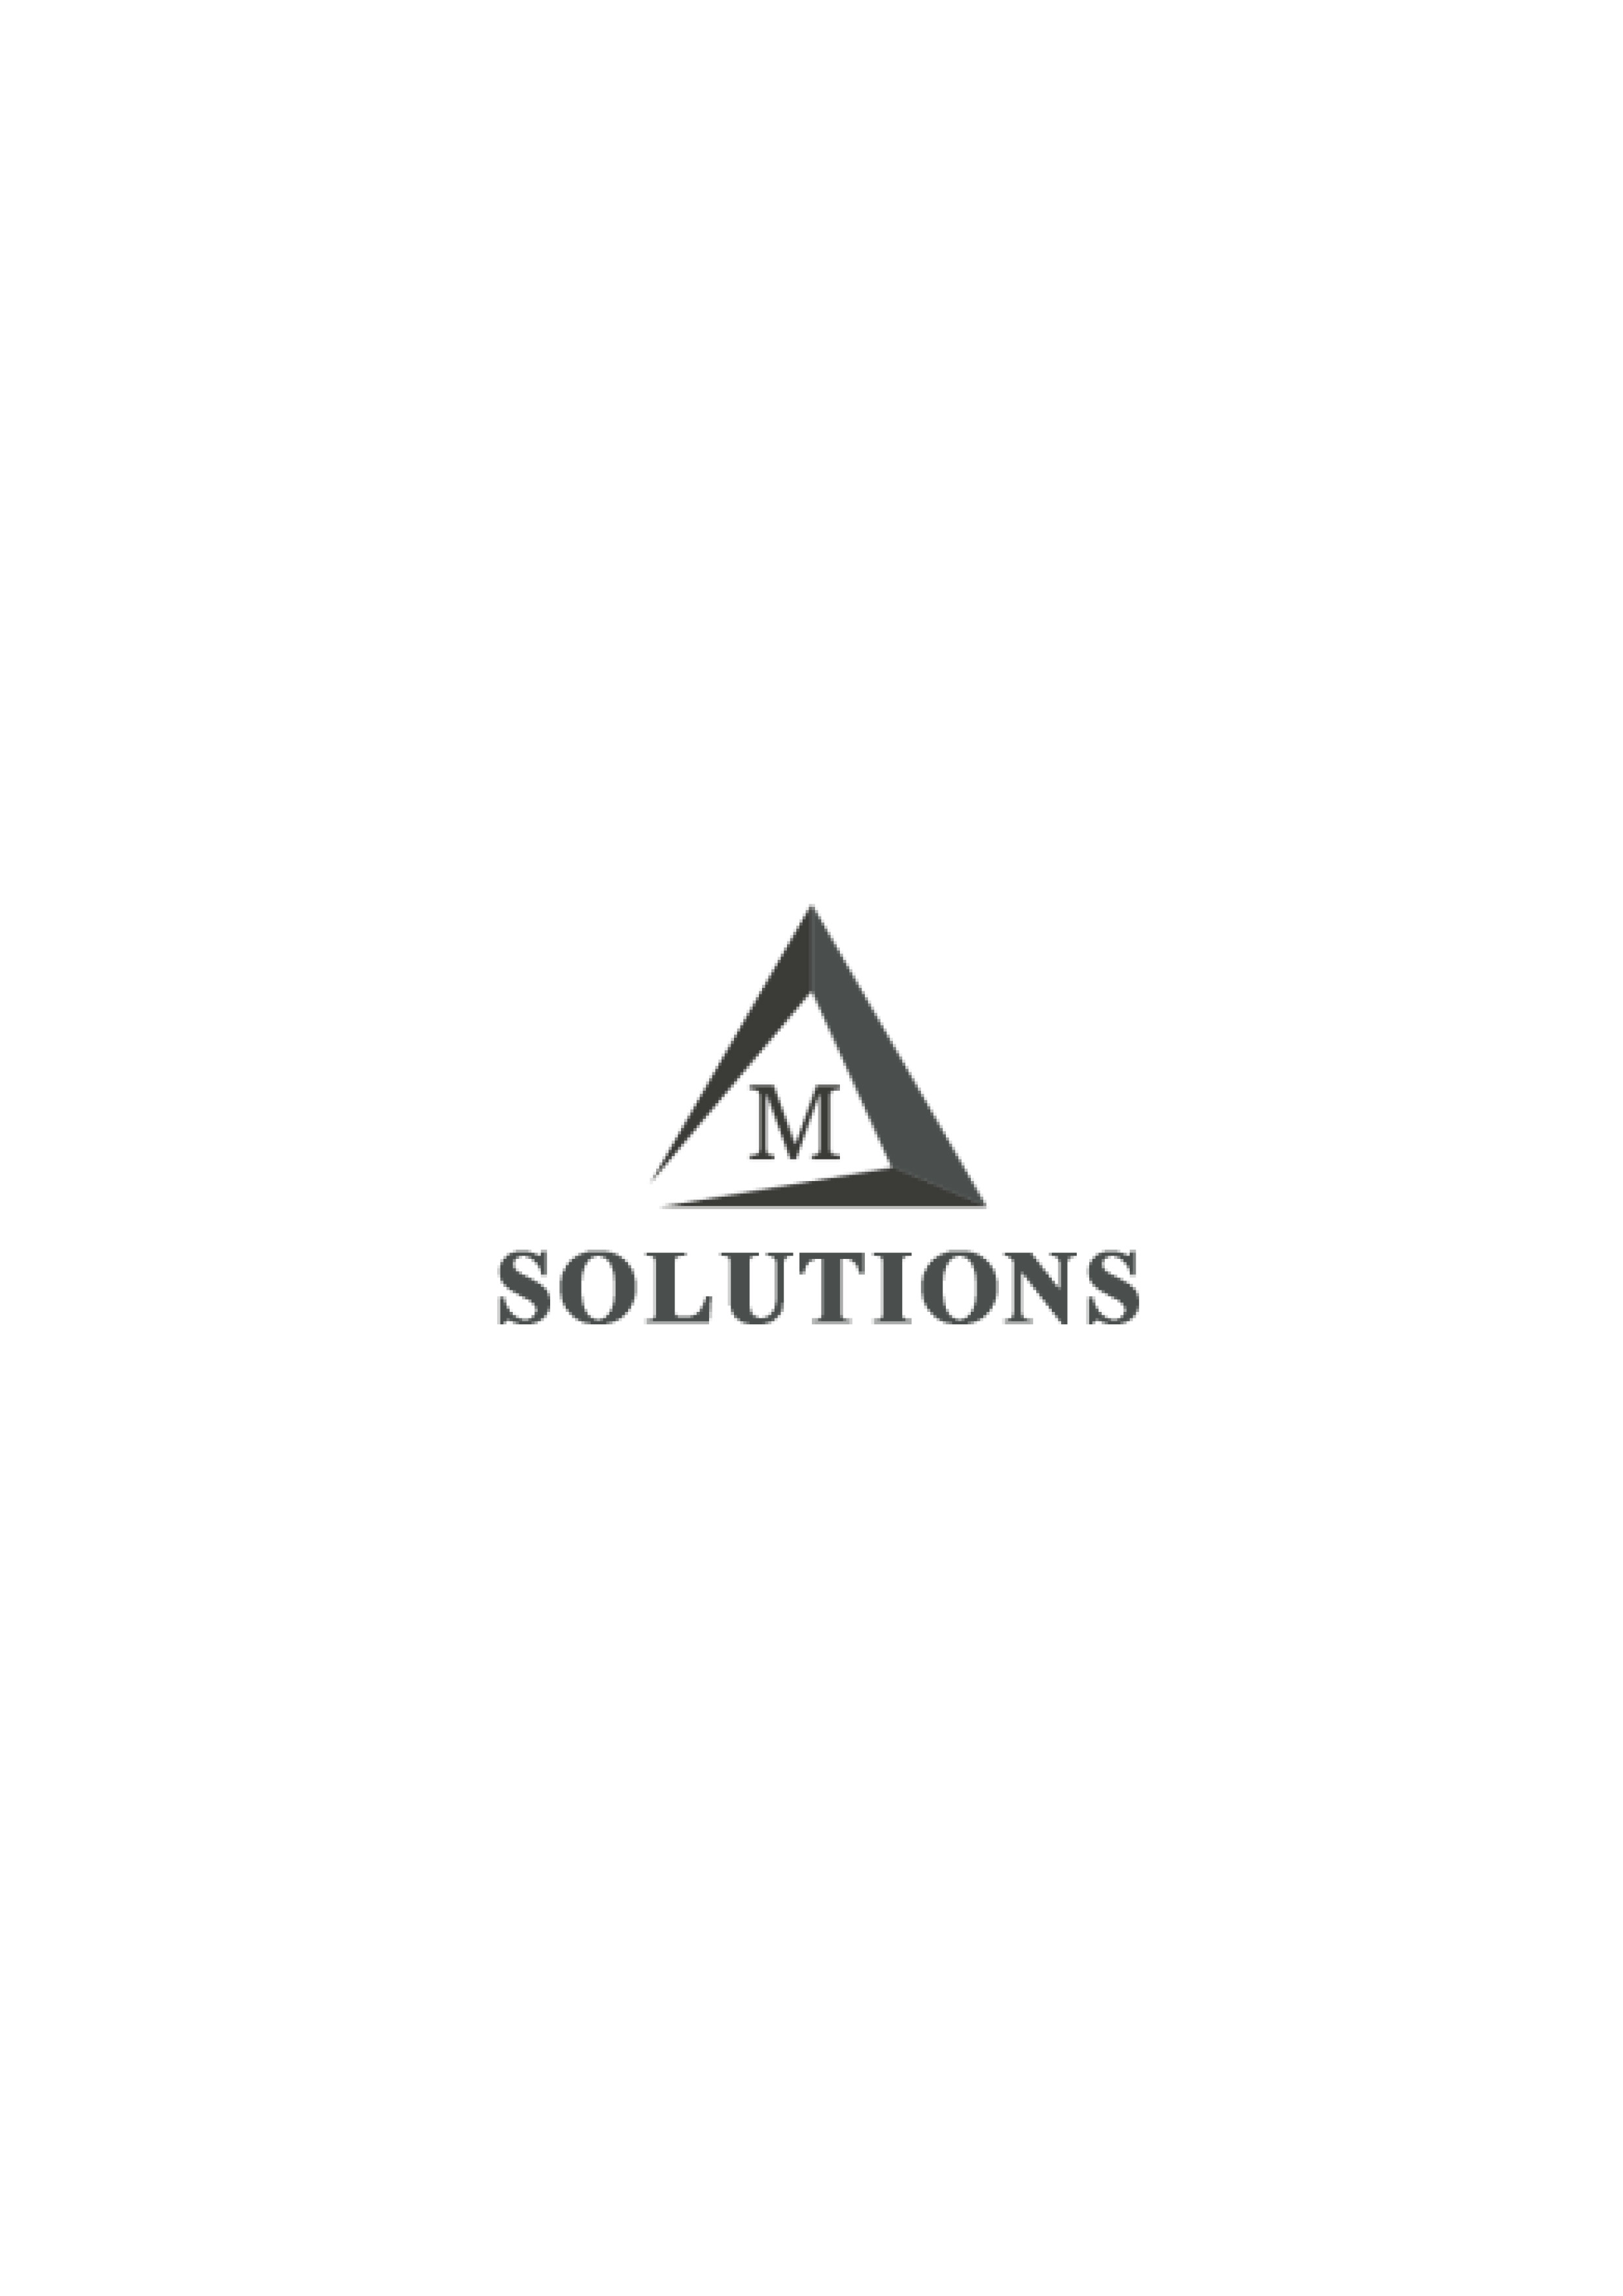 M Solutions Digital logo